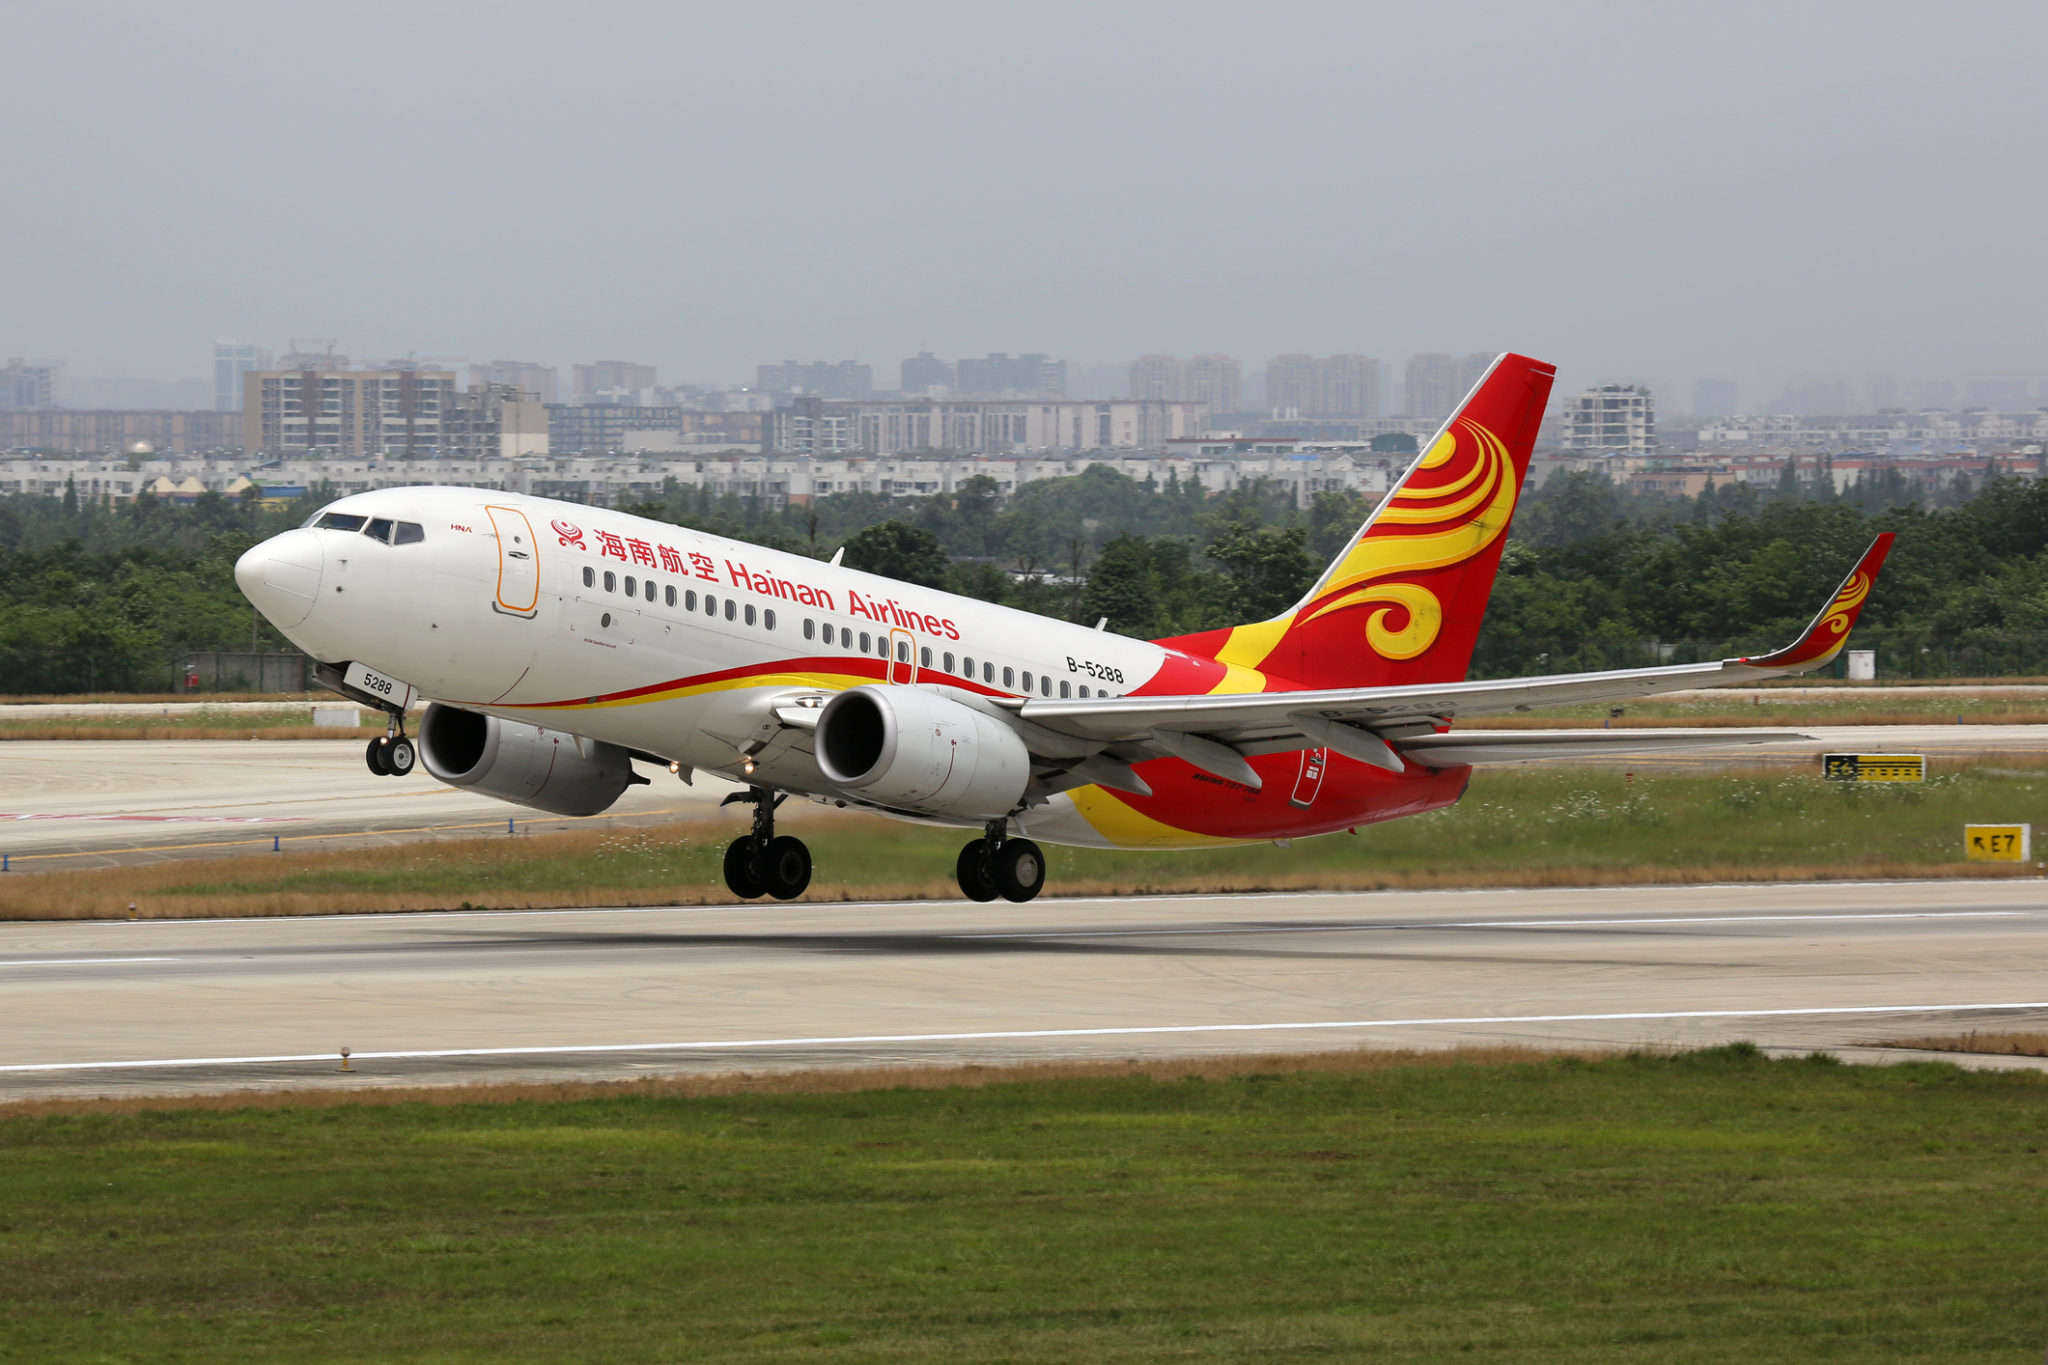 Letadlo Hainan